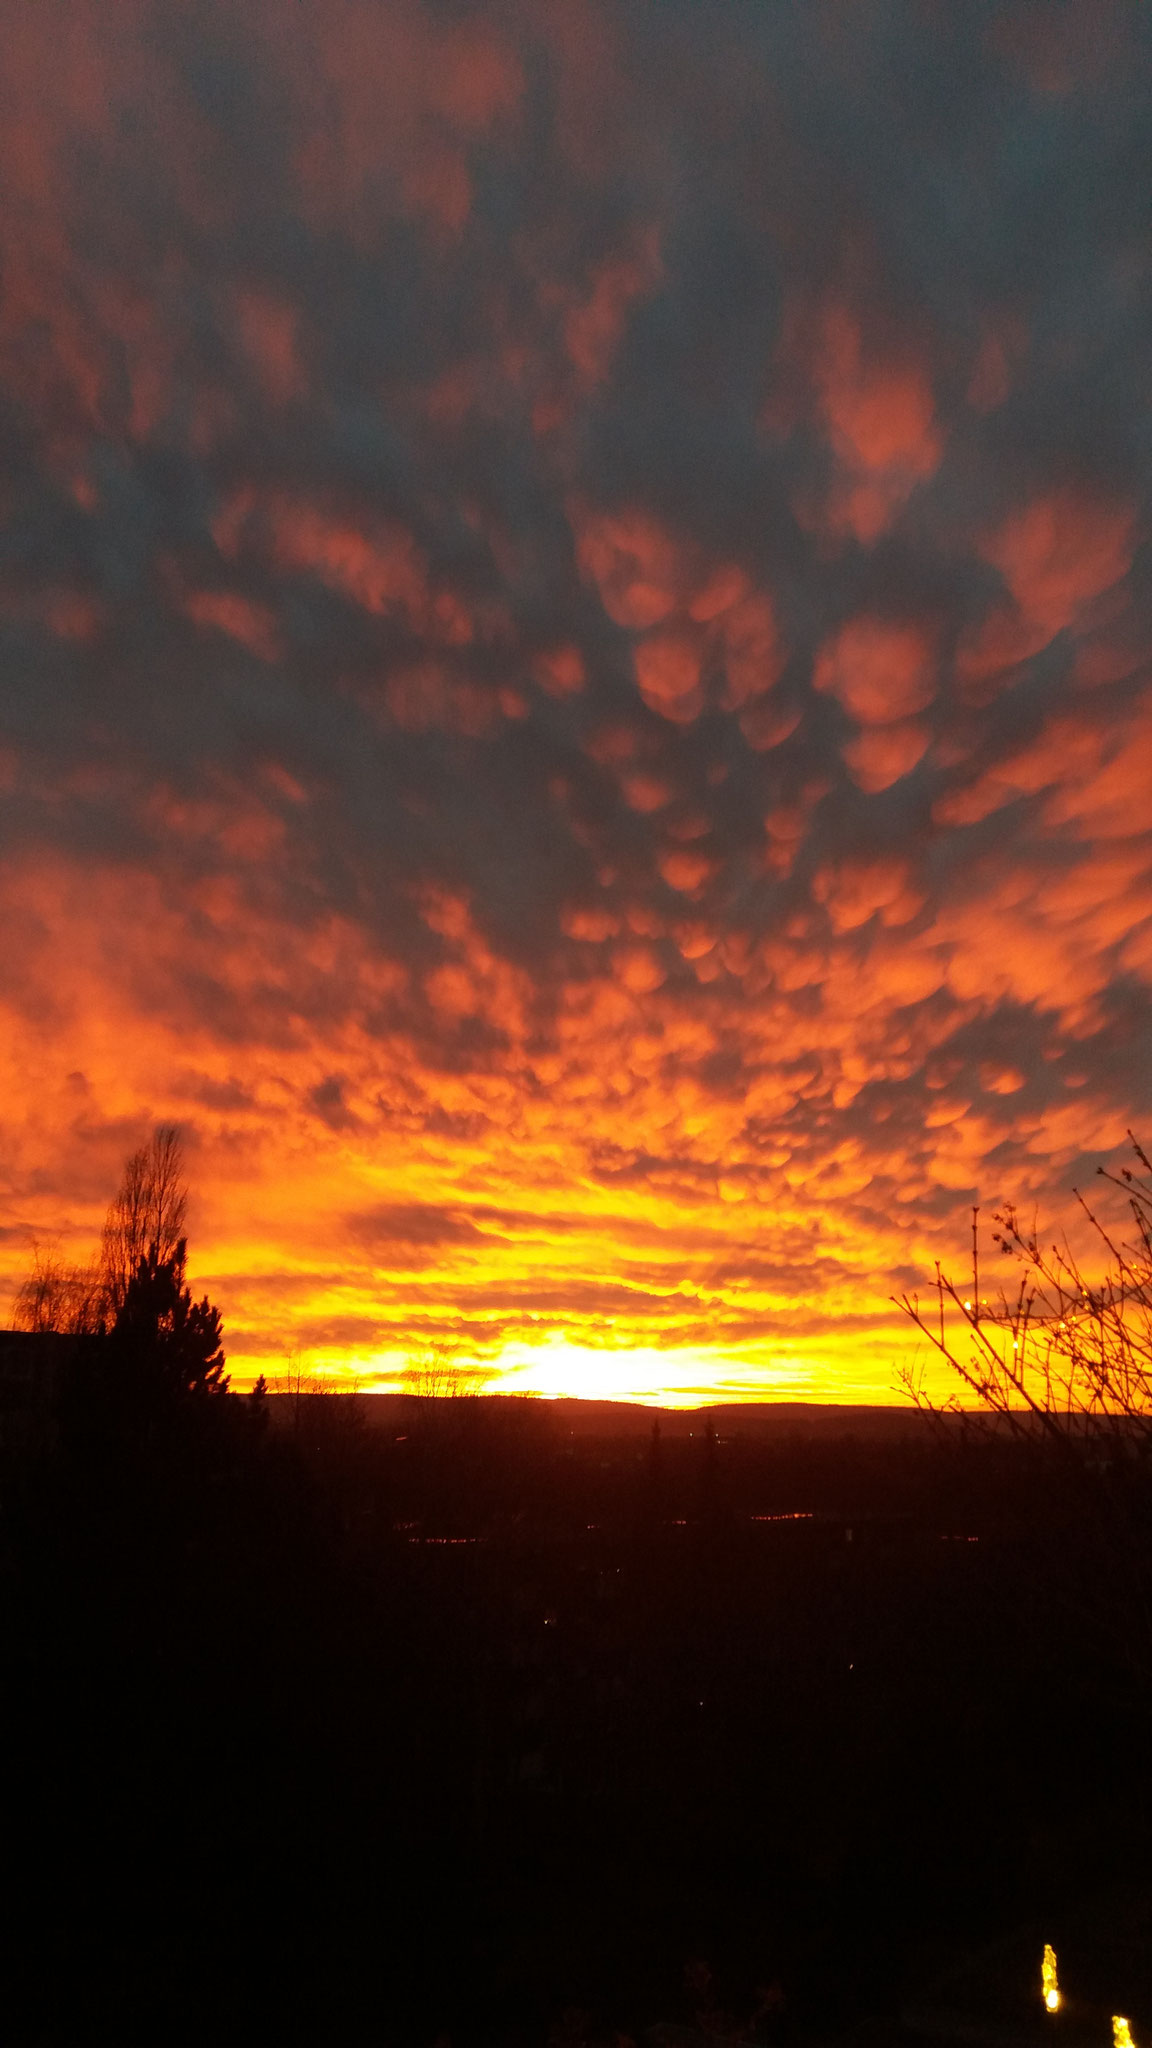 Sonnenuntergang, B. Schmalstieg